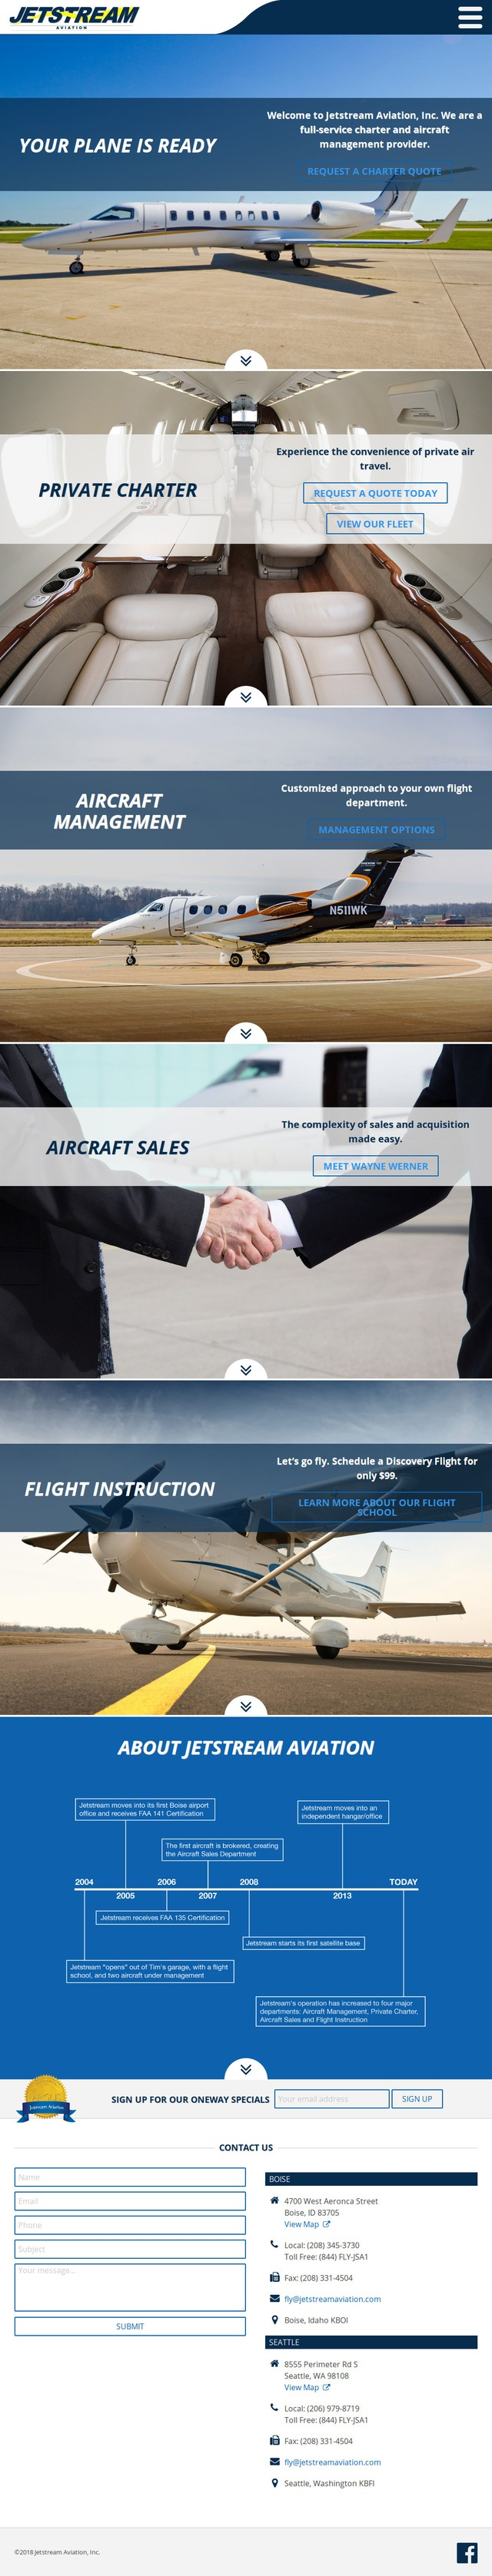 jetstreamaviation.com